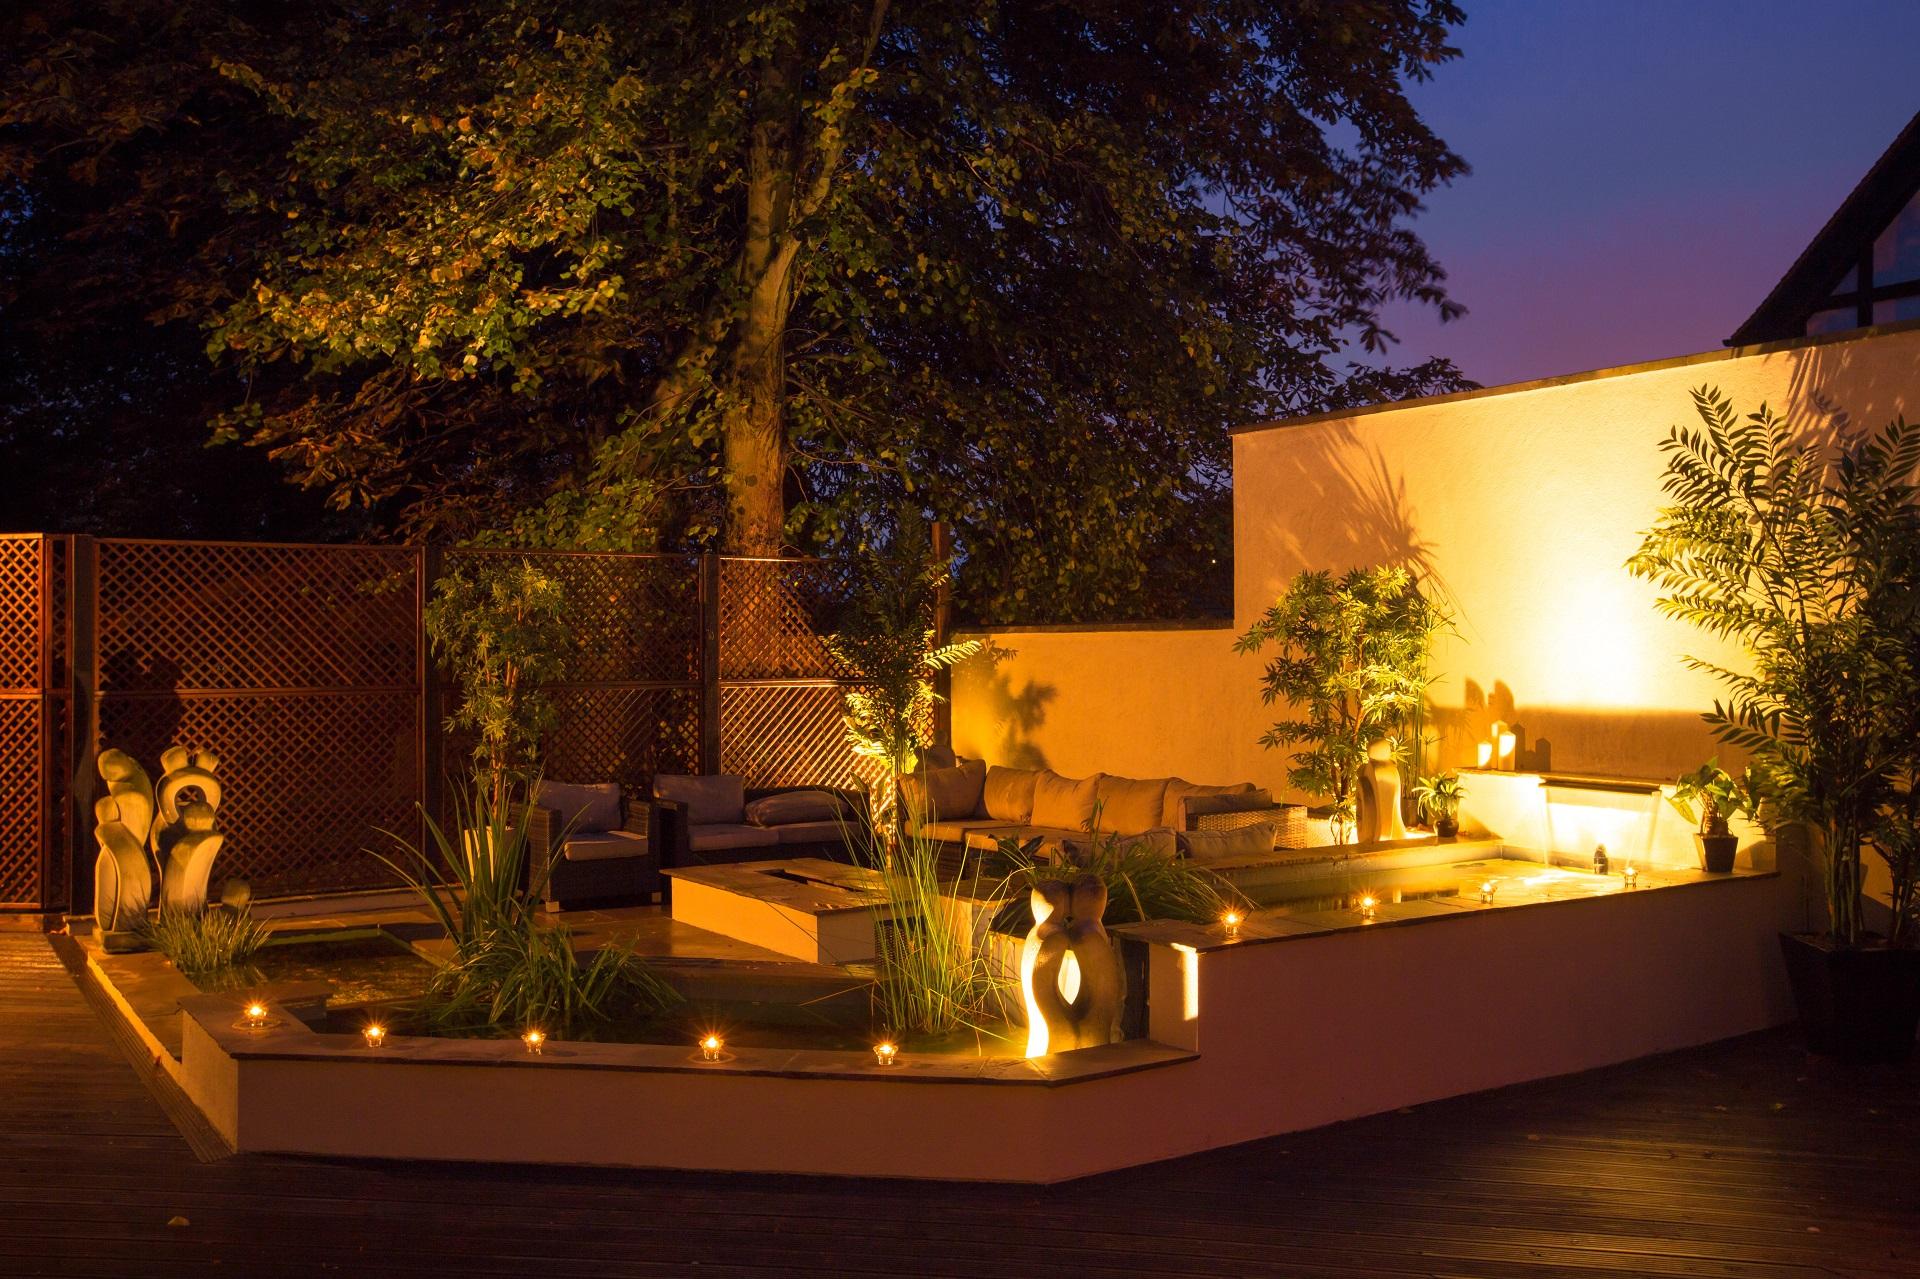 ambient lighting, luxury property design, garden design, courtyard, patio, decking, waterfall